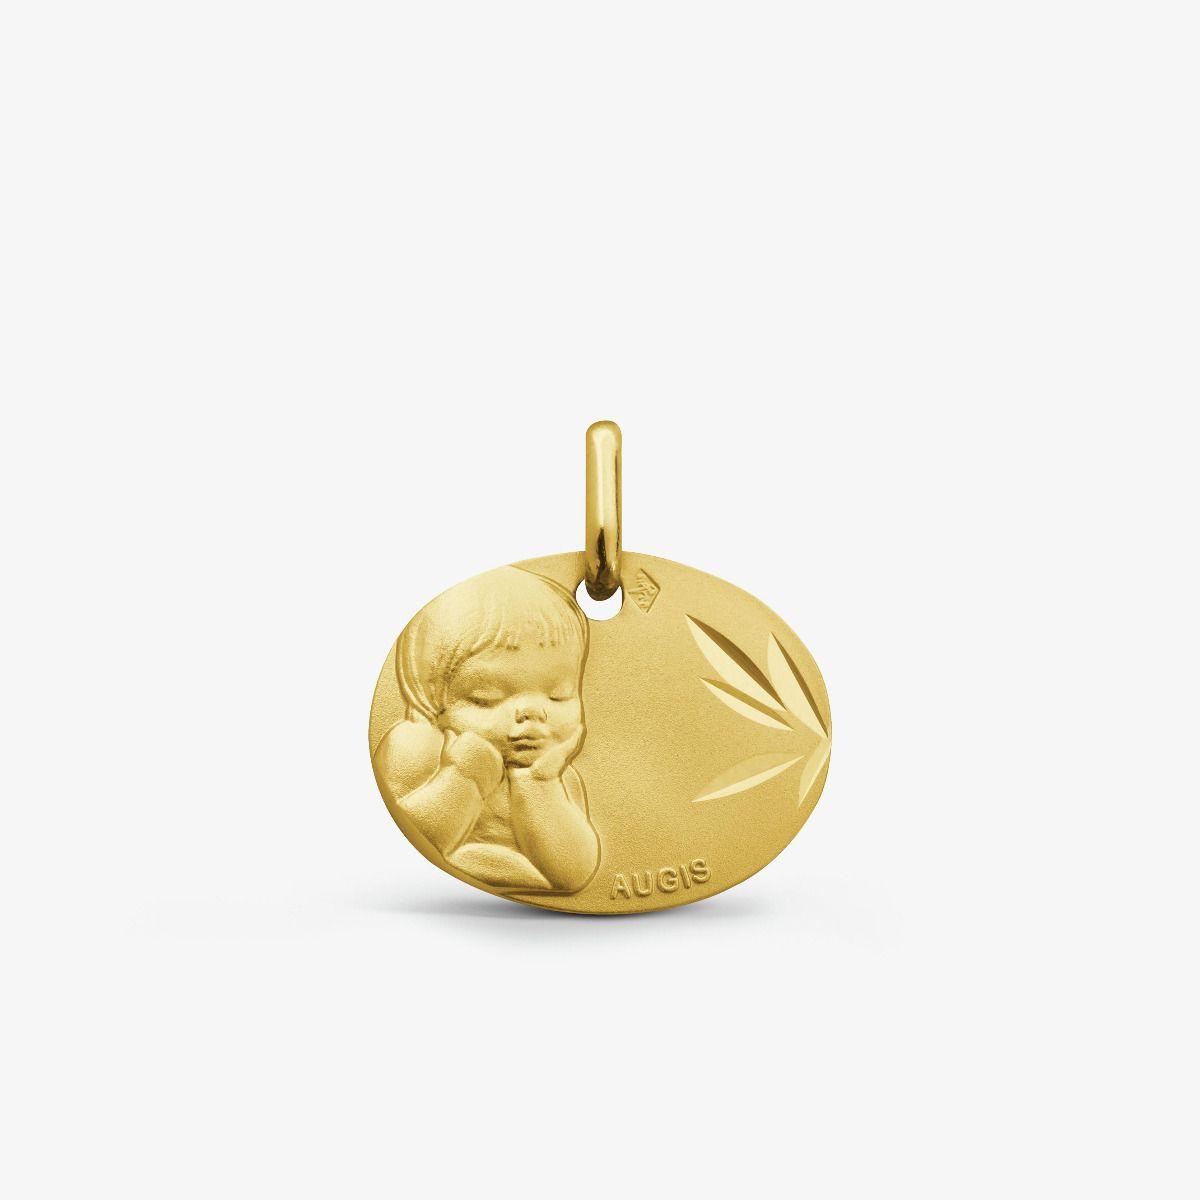 Médaille Chérubin rêveur Or Jaune 9 carats - 16 mm